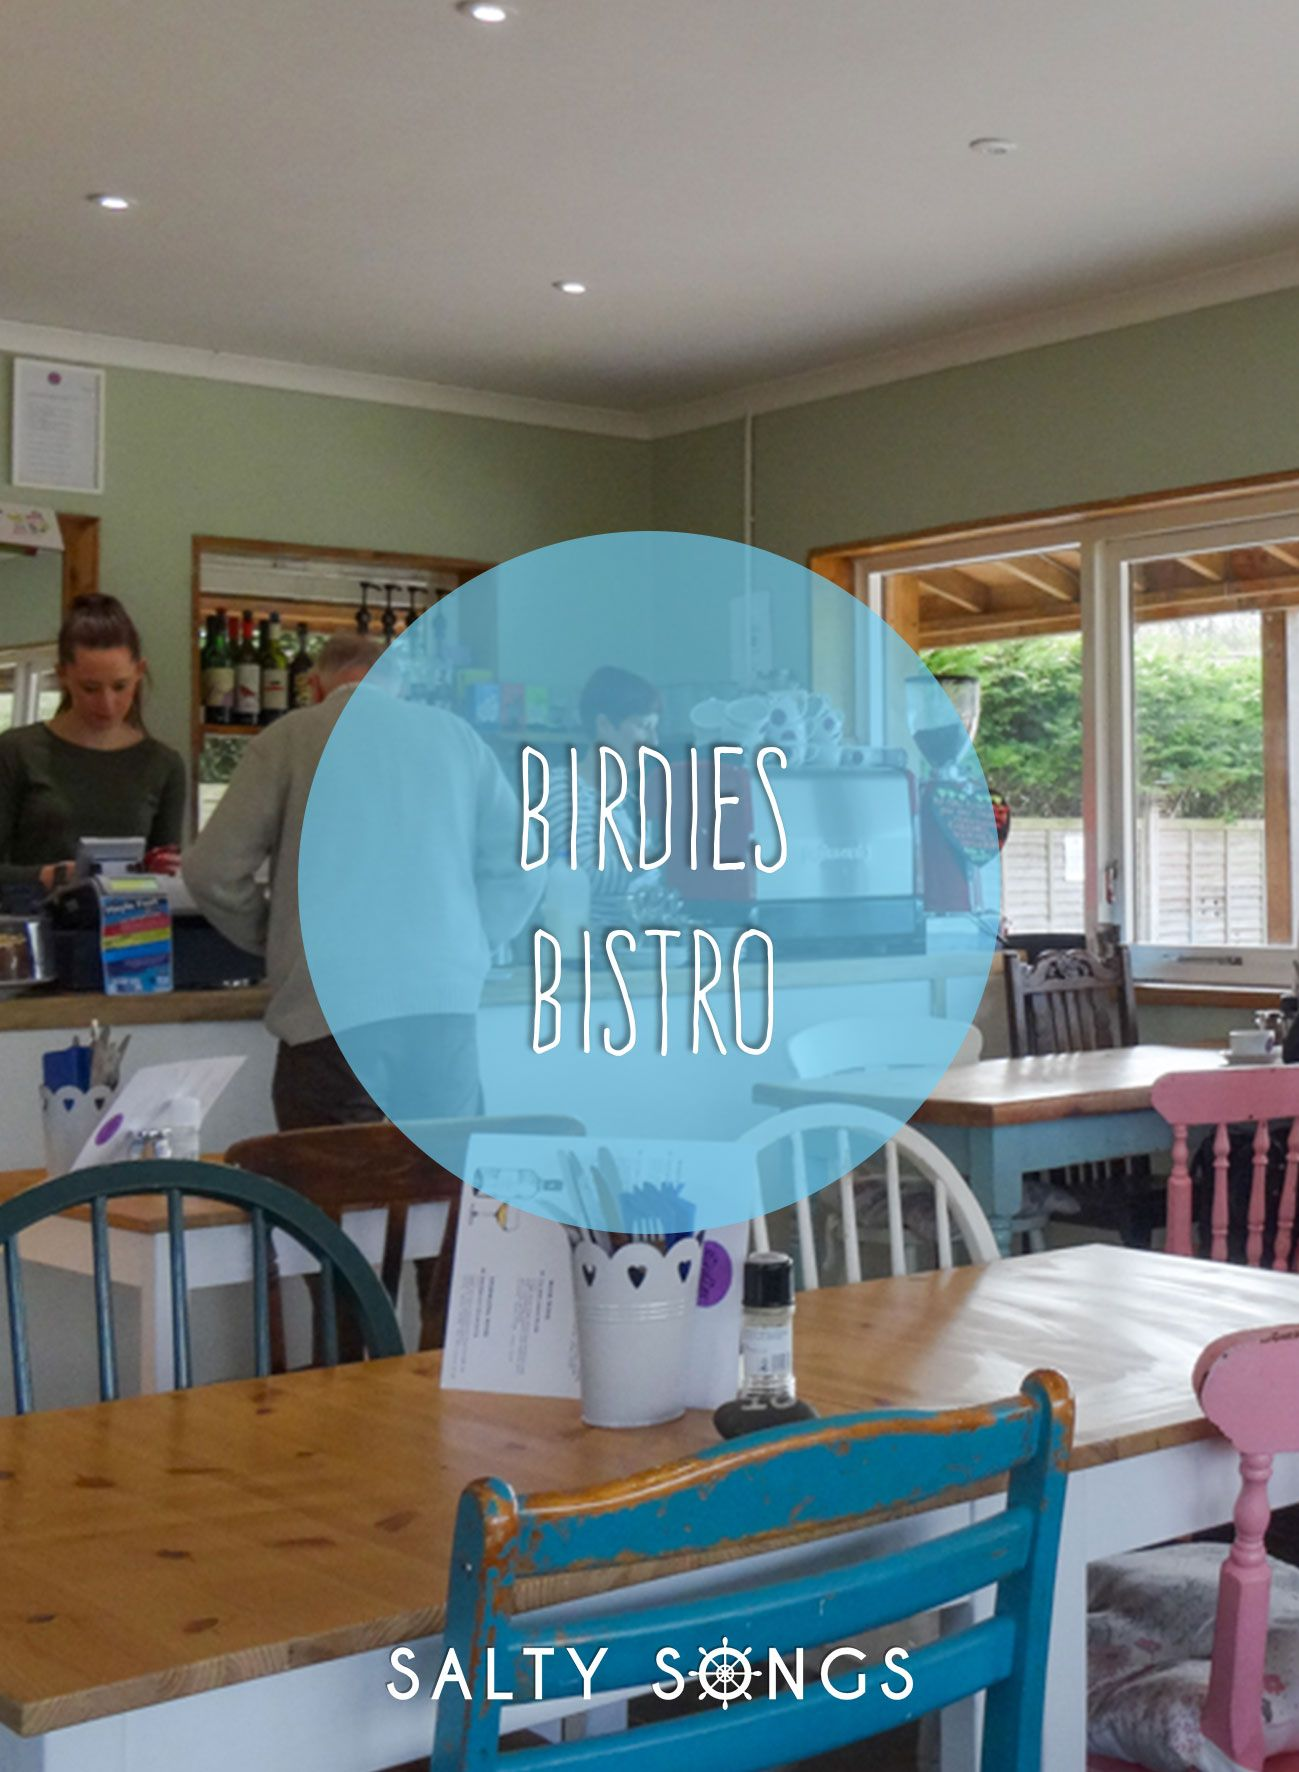 Breakfast At Birdies Bistro, Hayle Estuary, Cornwall